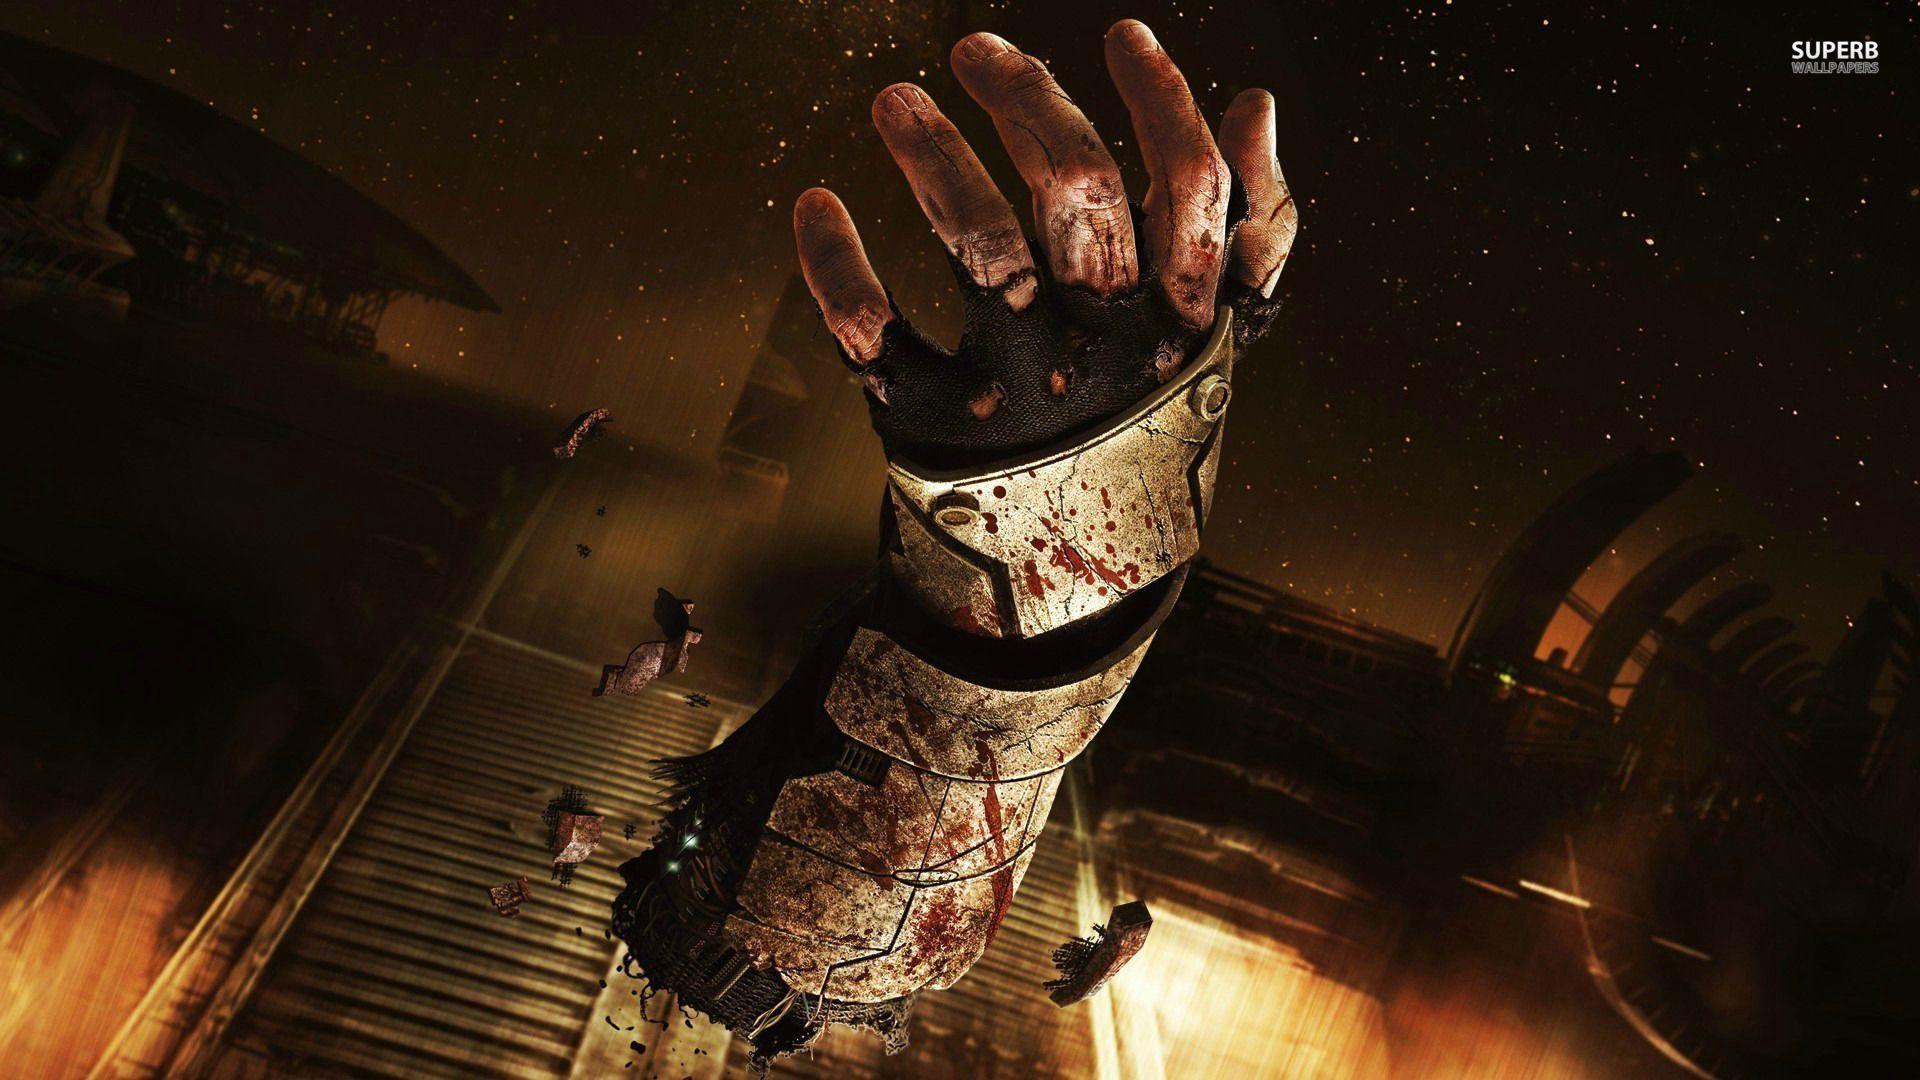 Dead Space 2 Wallpaper (81+ images)